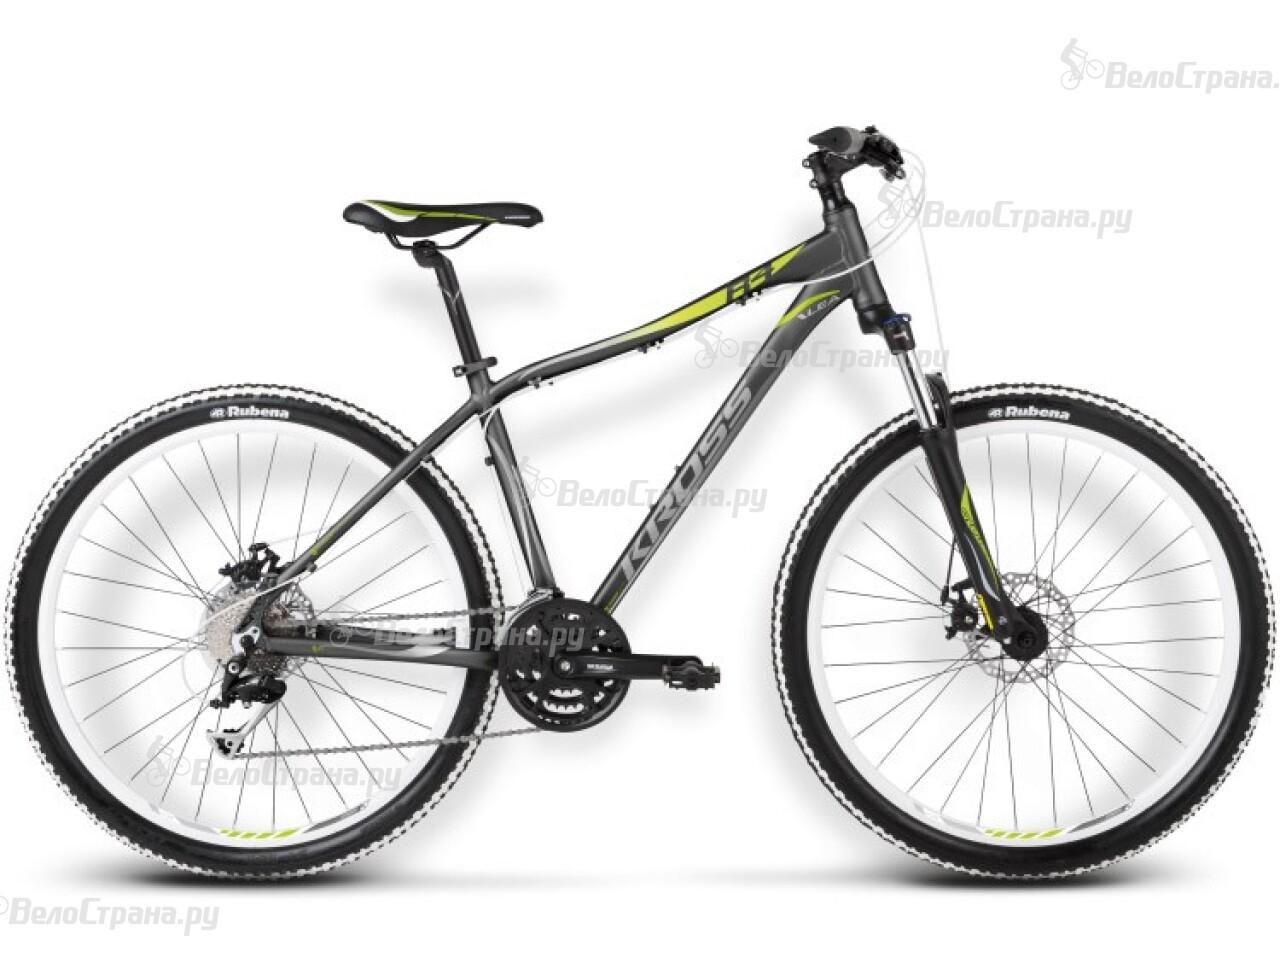 Велосипед Kross Lea R4 (2015)  r4 5a